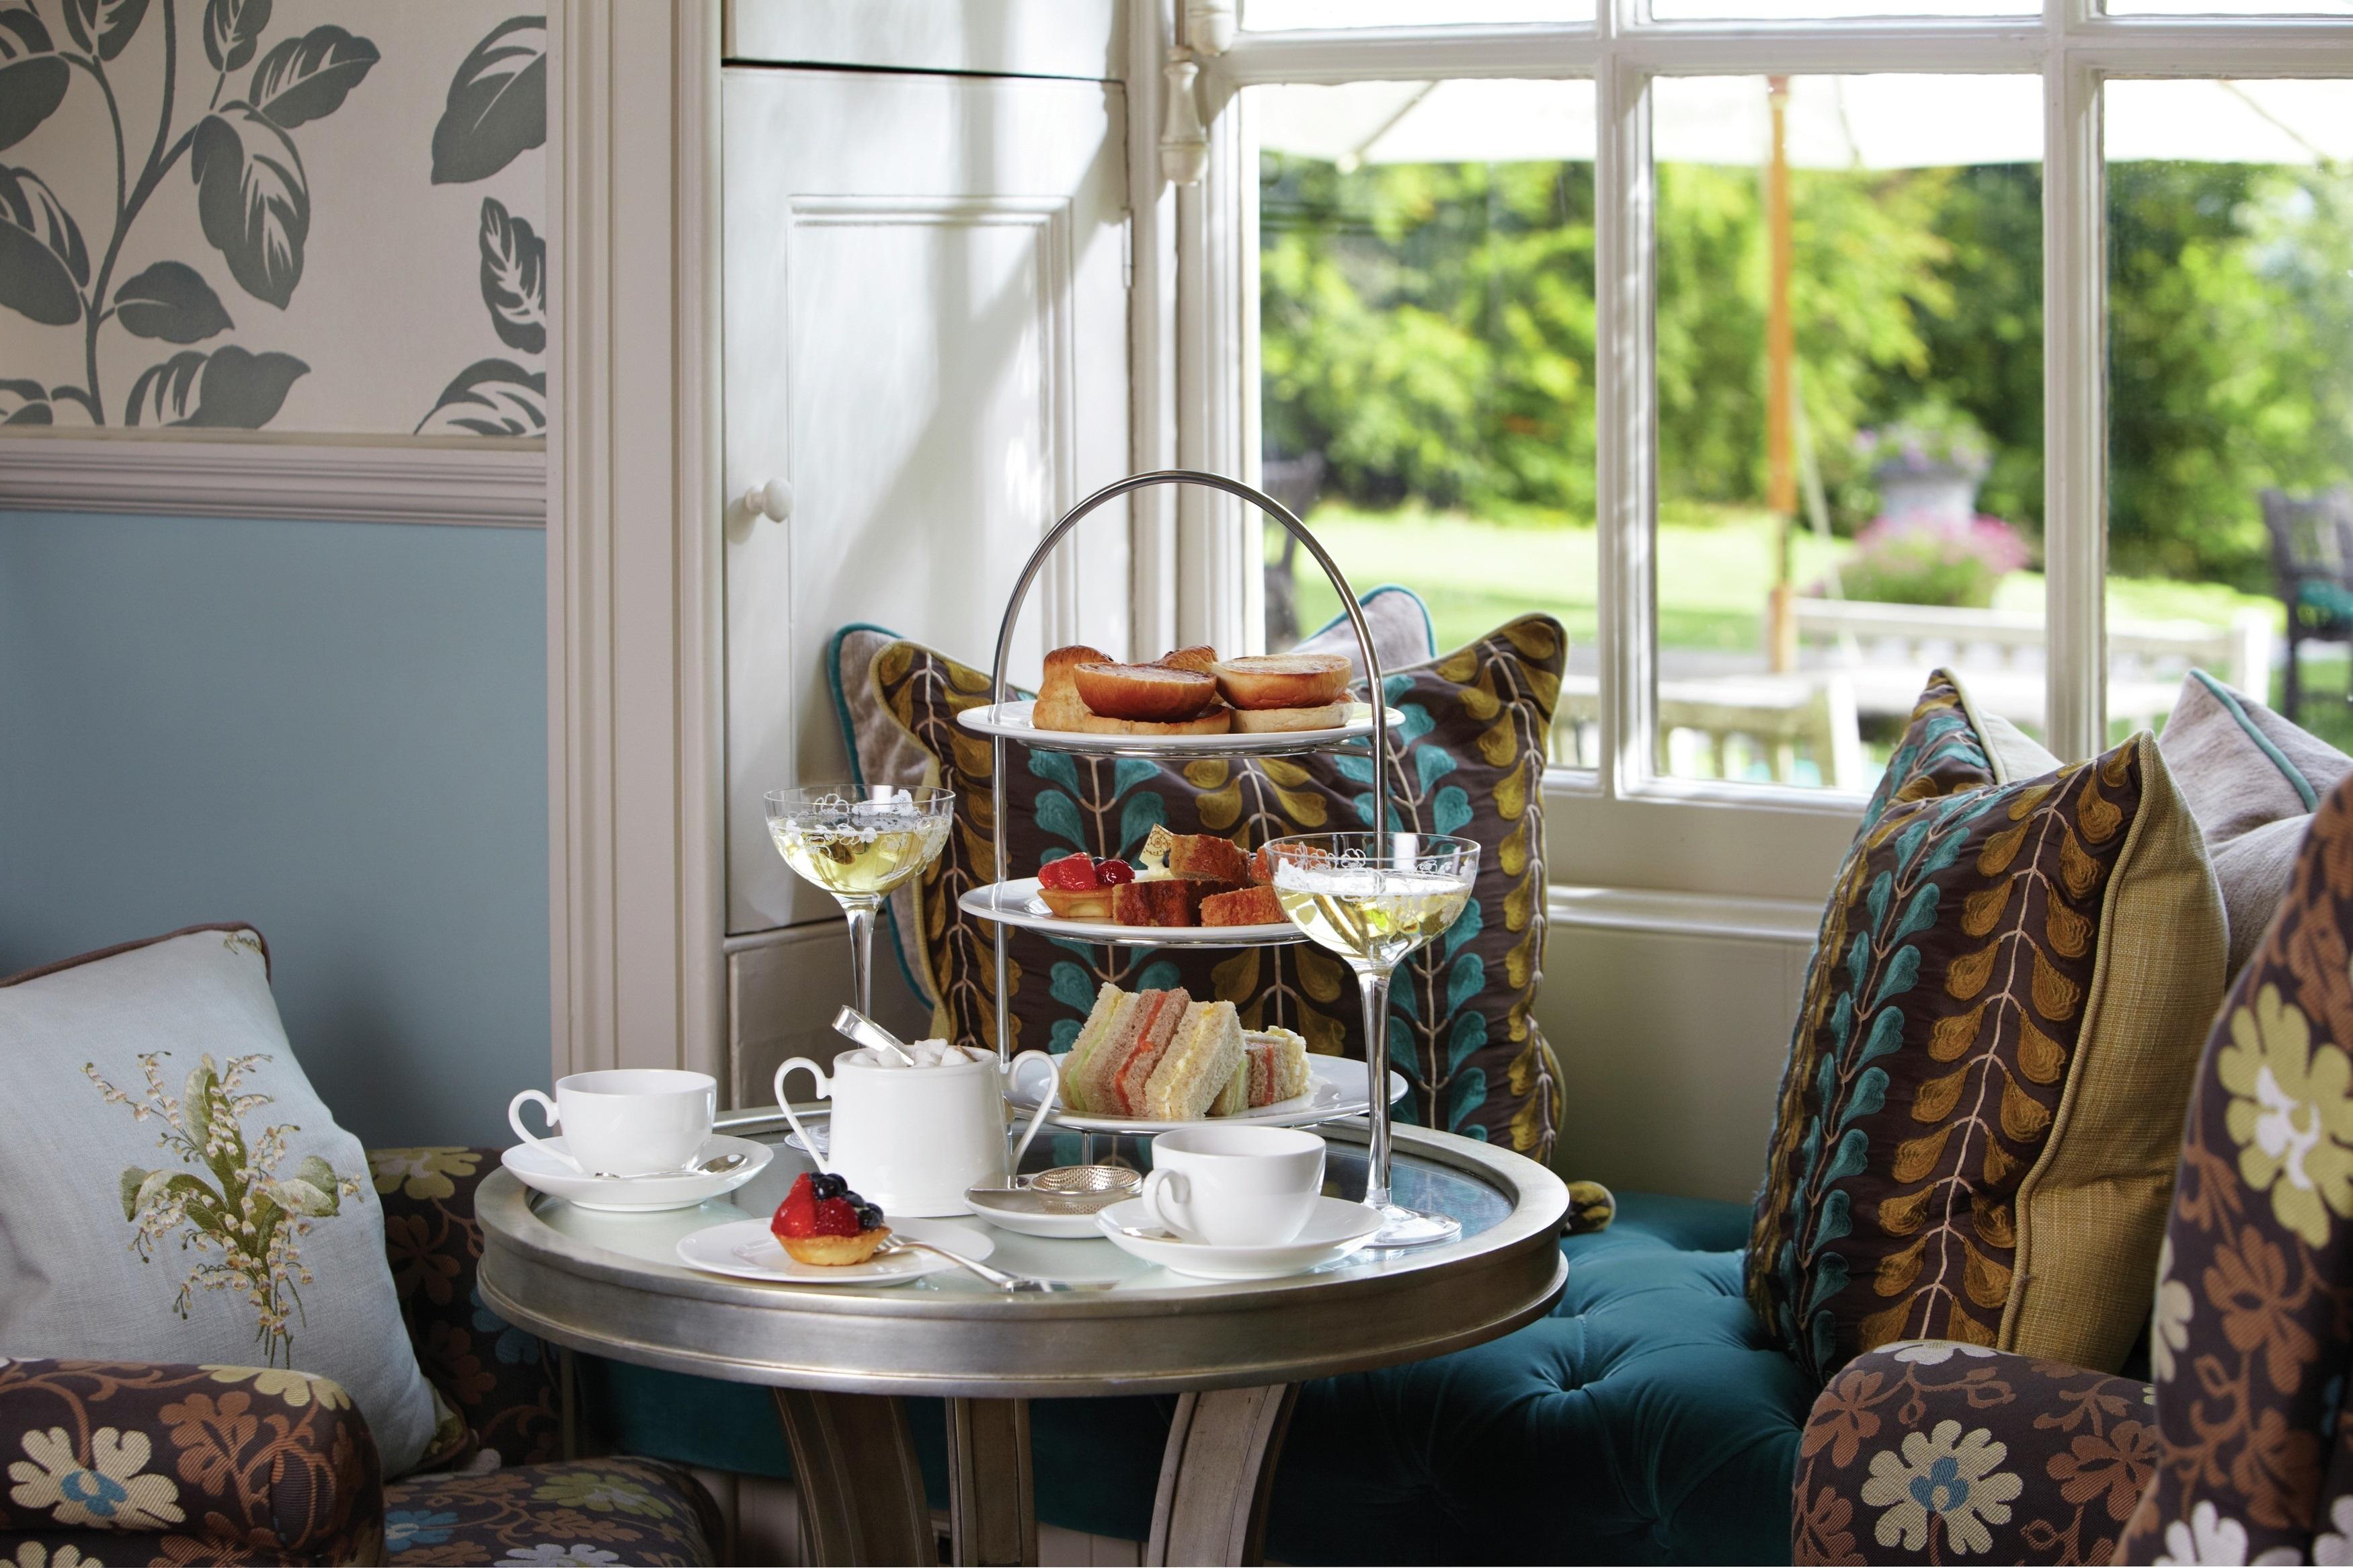 Lainston House Hotel Afternoon Tea